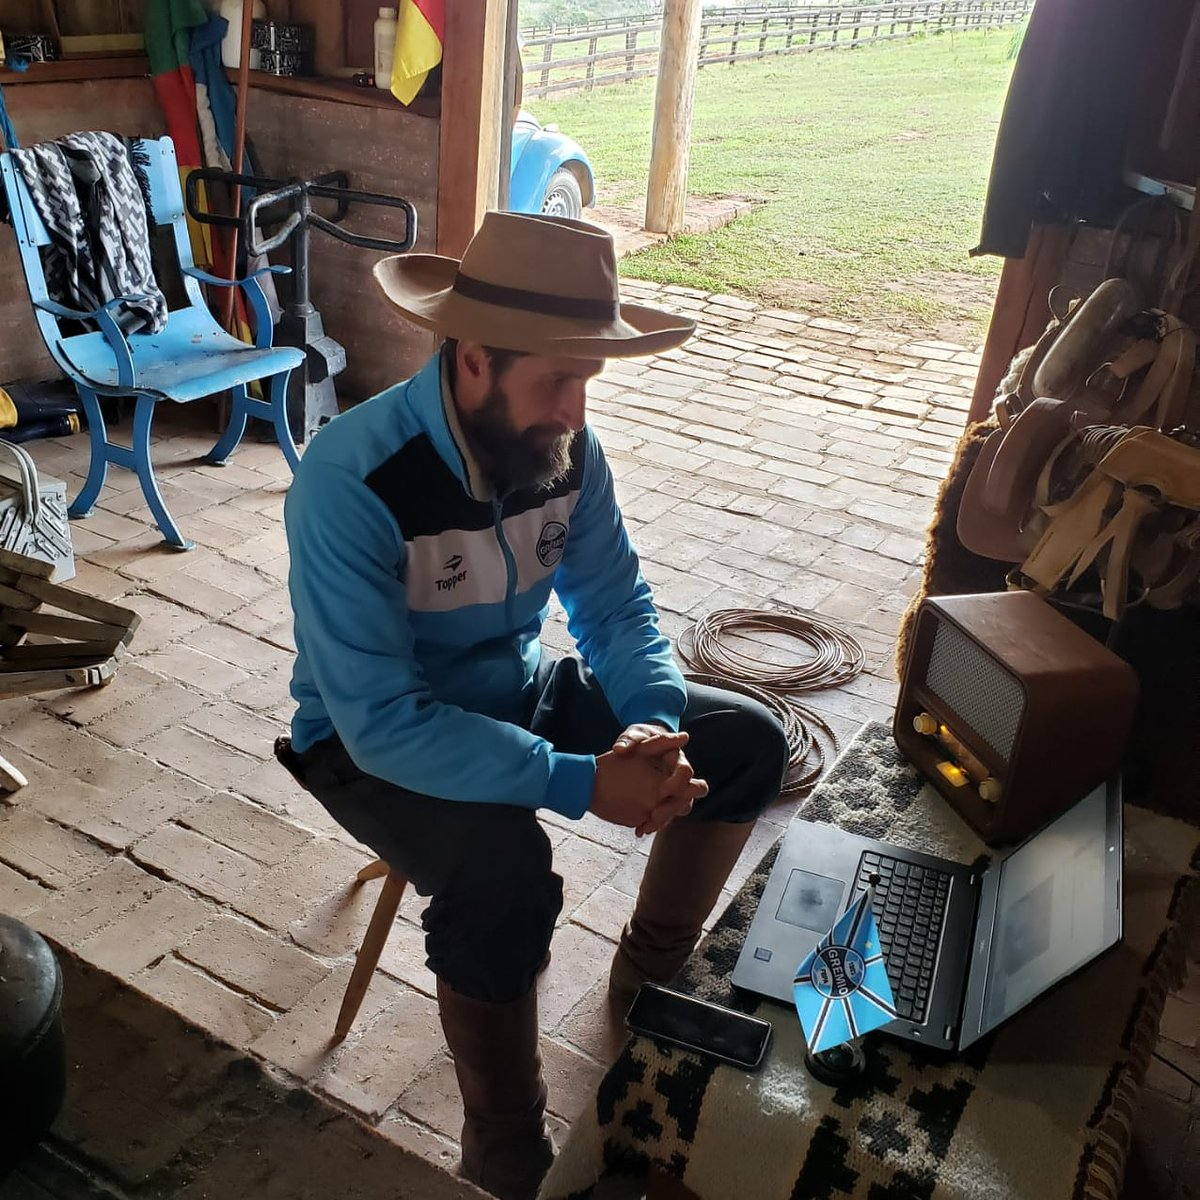 Trabalho e chuleando o Tricolor na Grêmio Rádio...  #gauchodageral #gauchodeputado  #gauchodogremio #gremio https://t.co/EEGS251RUE